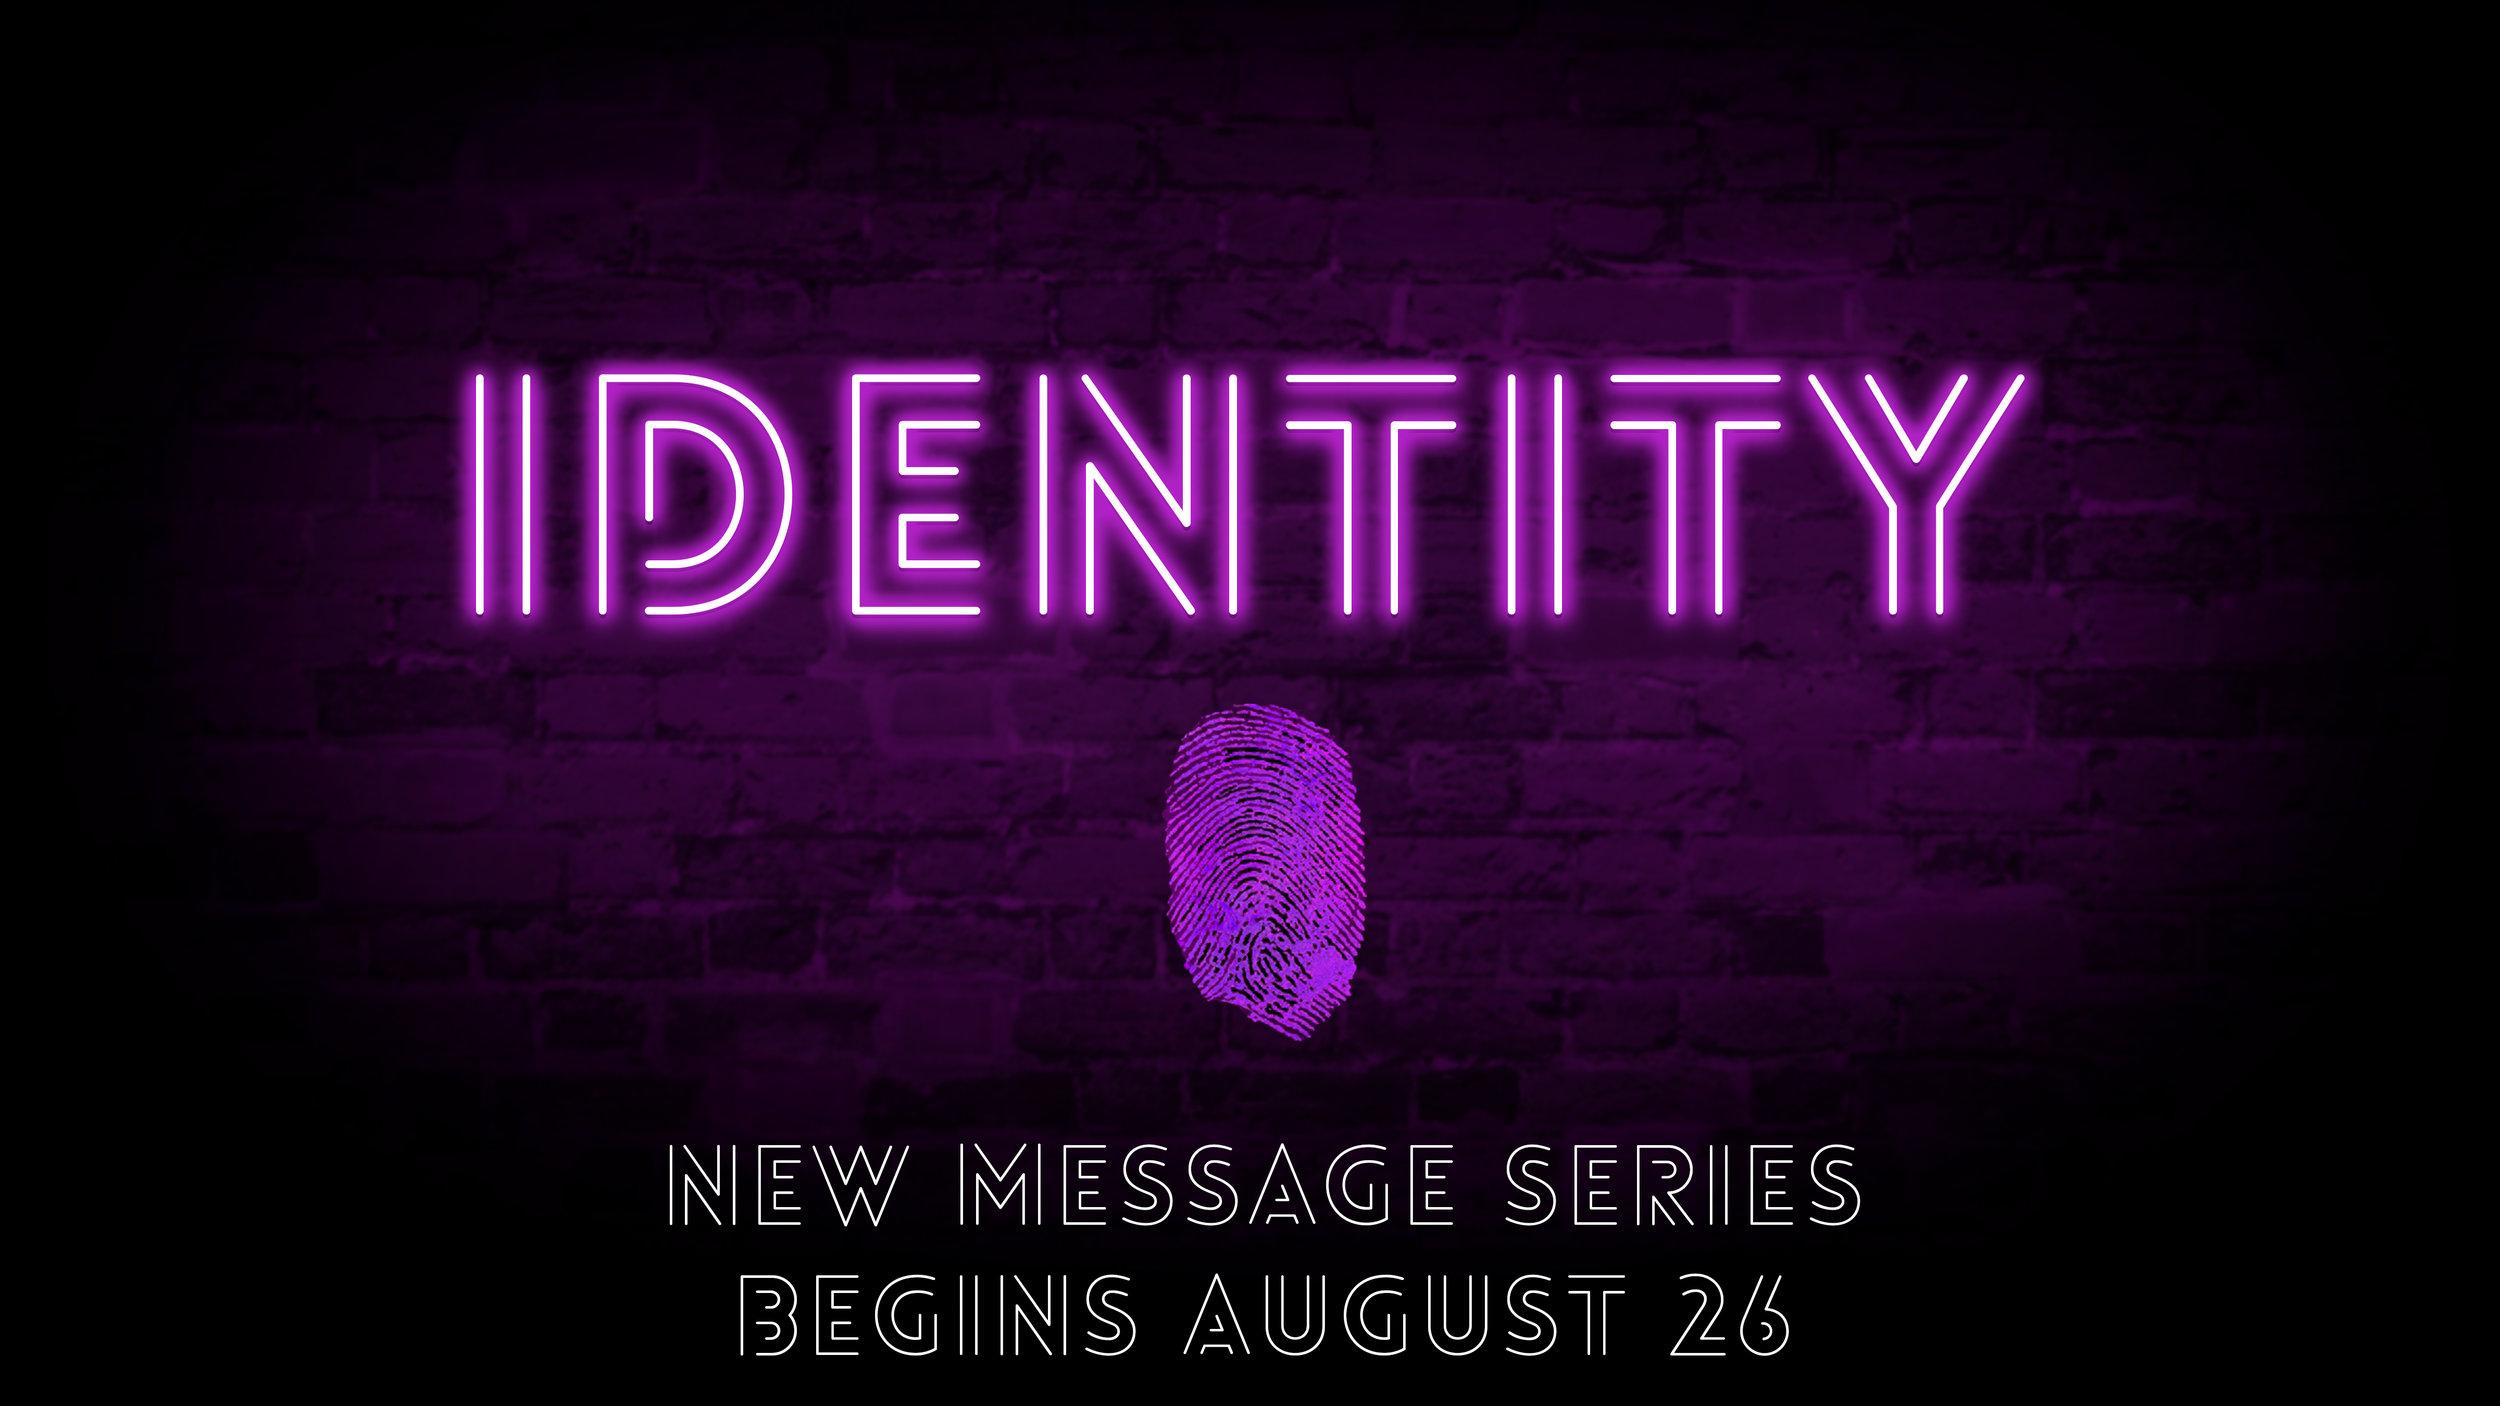 Identity_new series_1.jpg